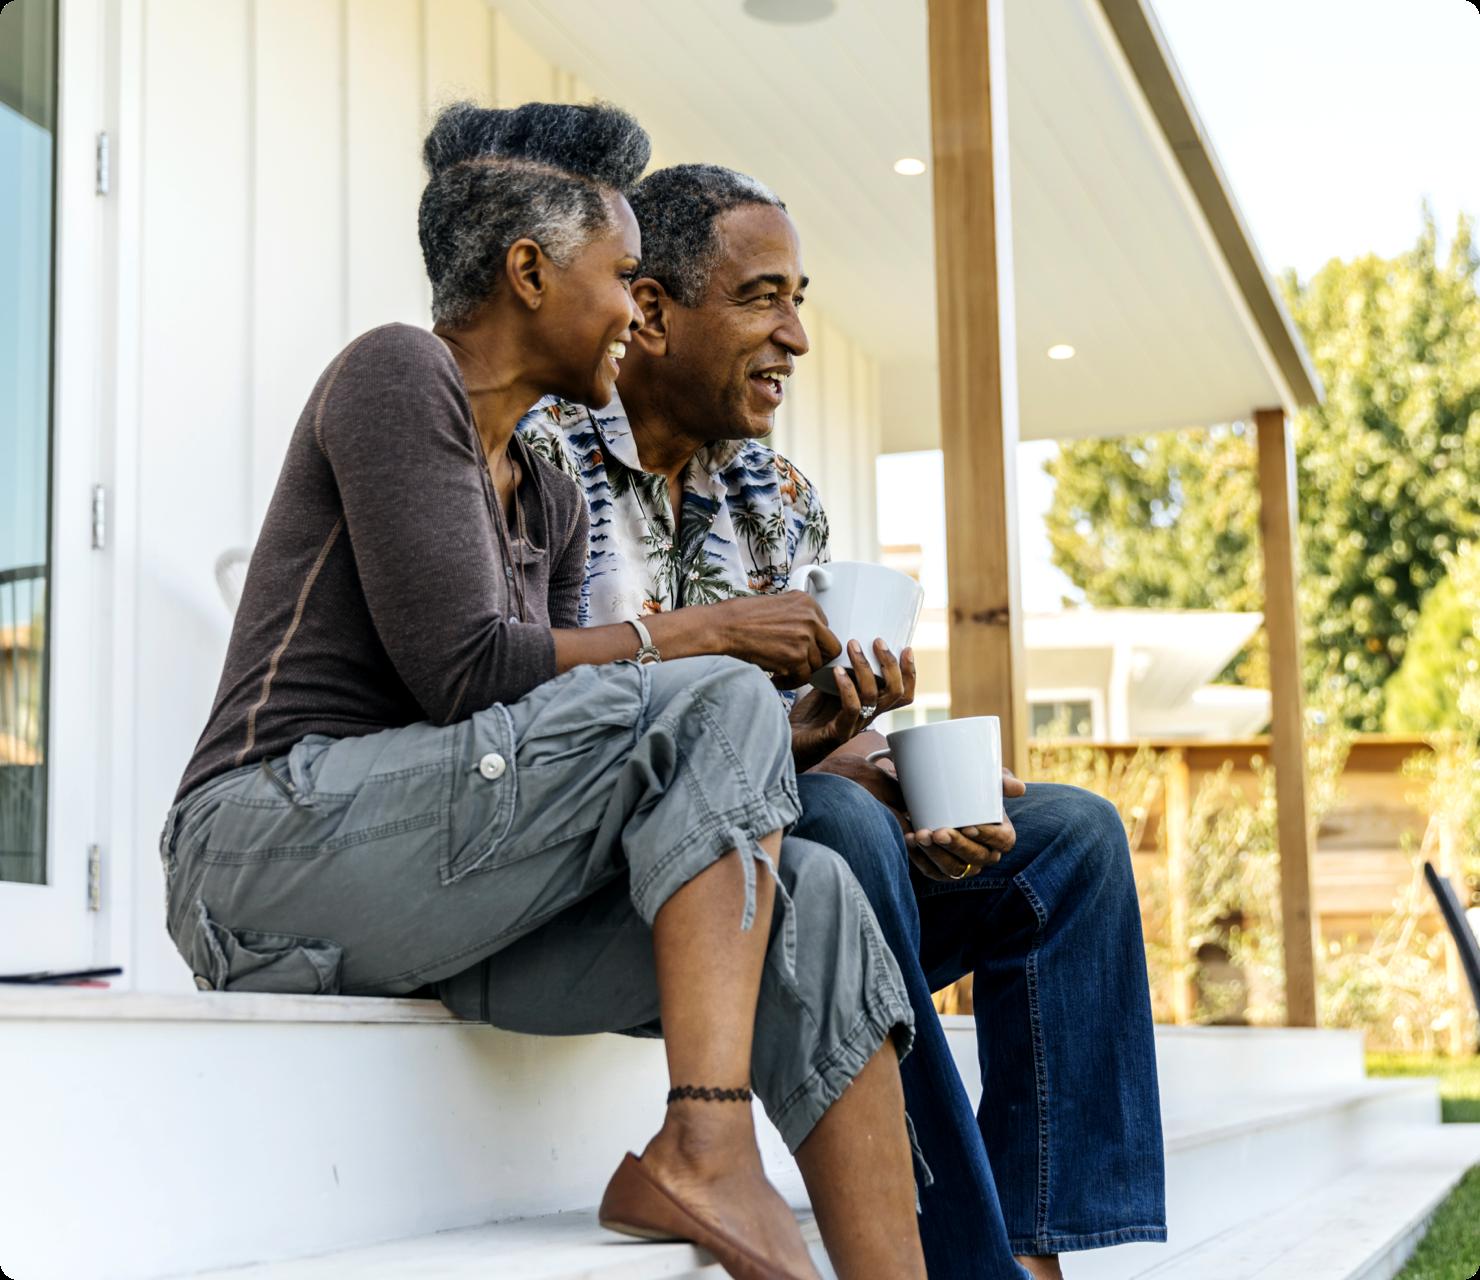 Elder couple drinking coffee on their porch